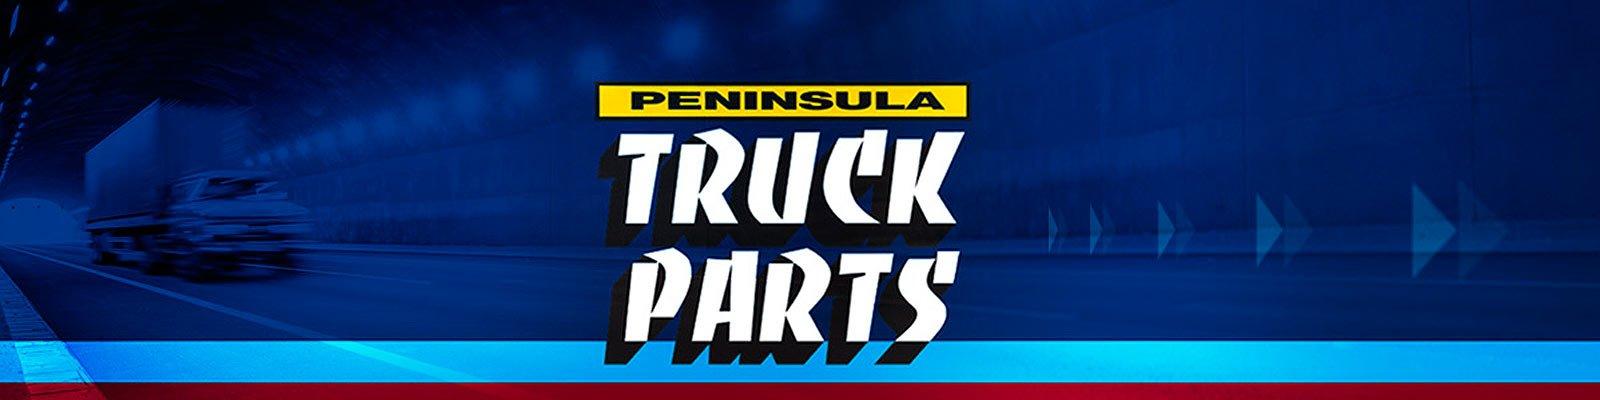 Peninsula-Truck-Parts-logo